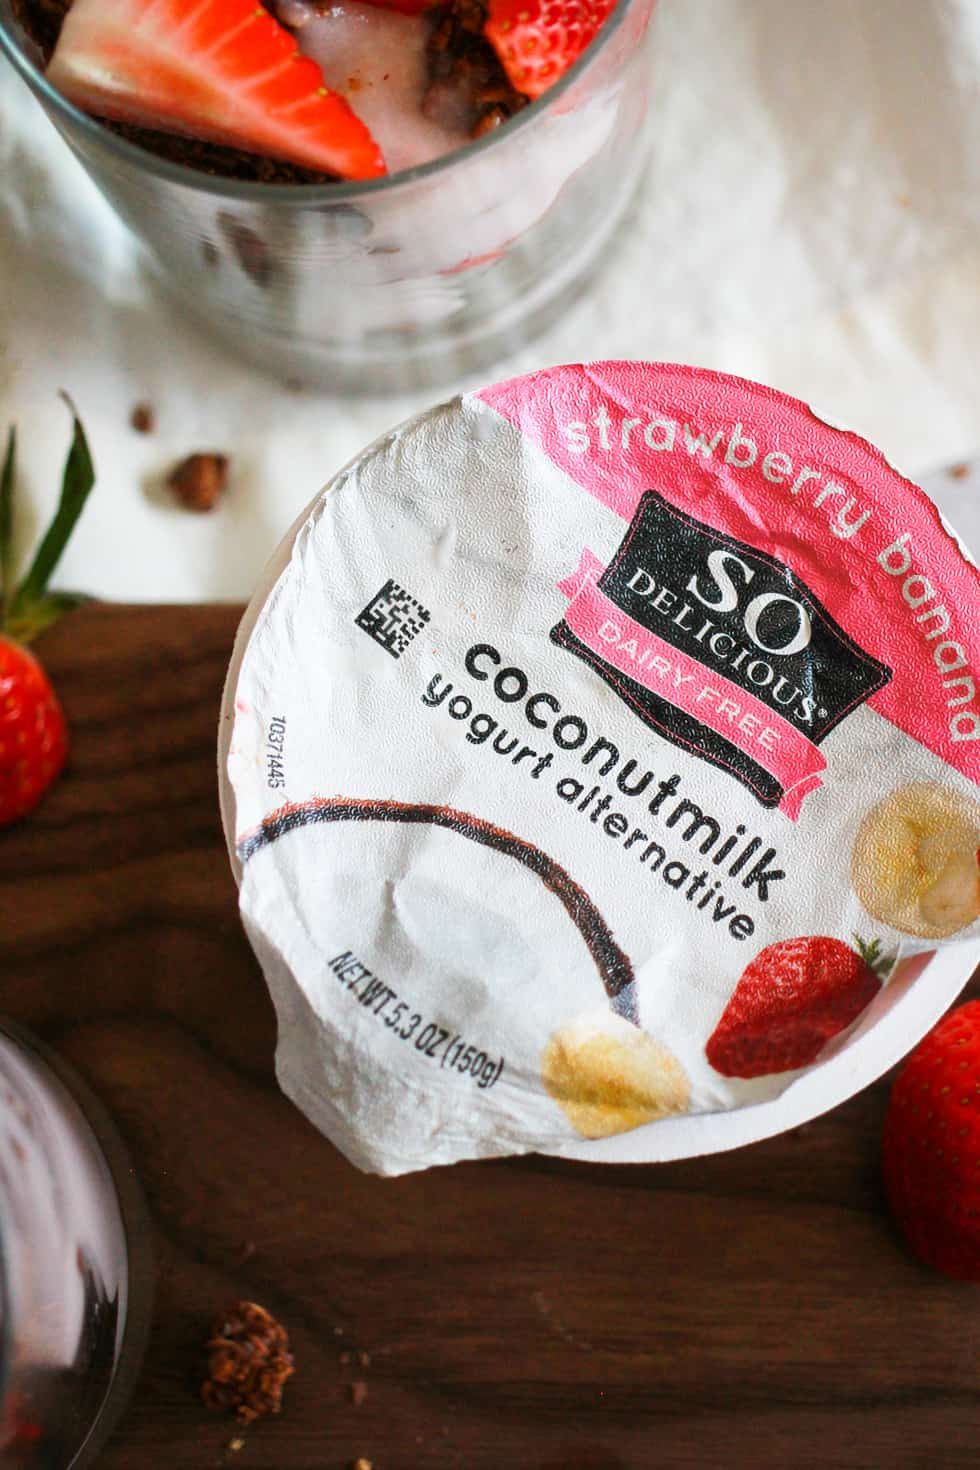 Carton of So Delicious strawberry banana yogurt alternative.